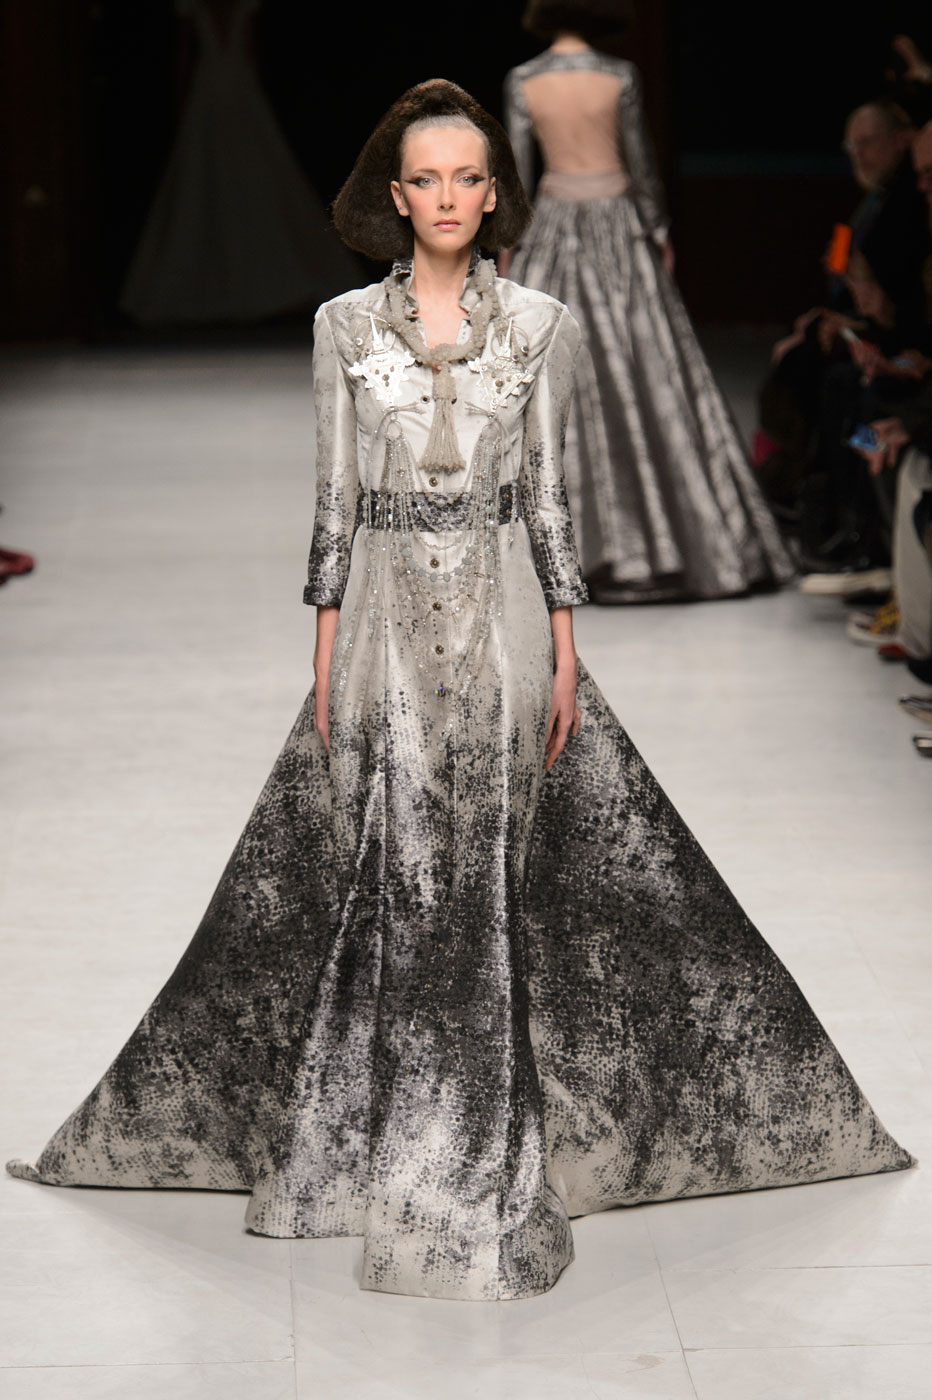 Julien-Fournie-Prive-fashion-runway-show-haute-couture-paris-spring-2015-the-impression-34